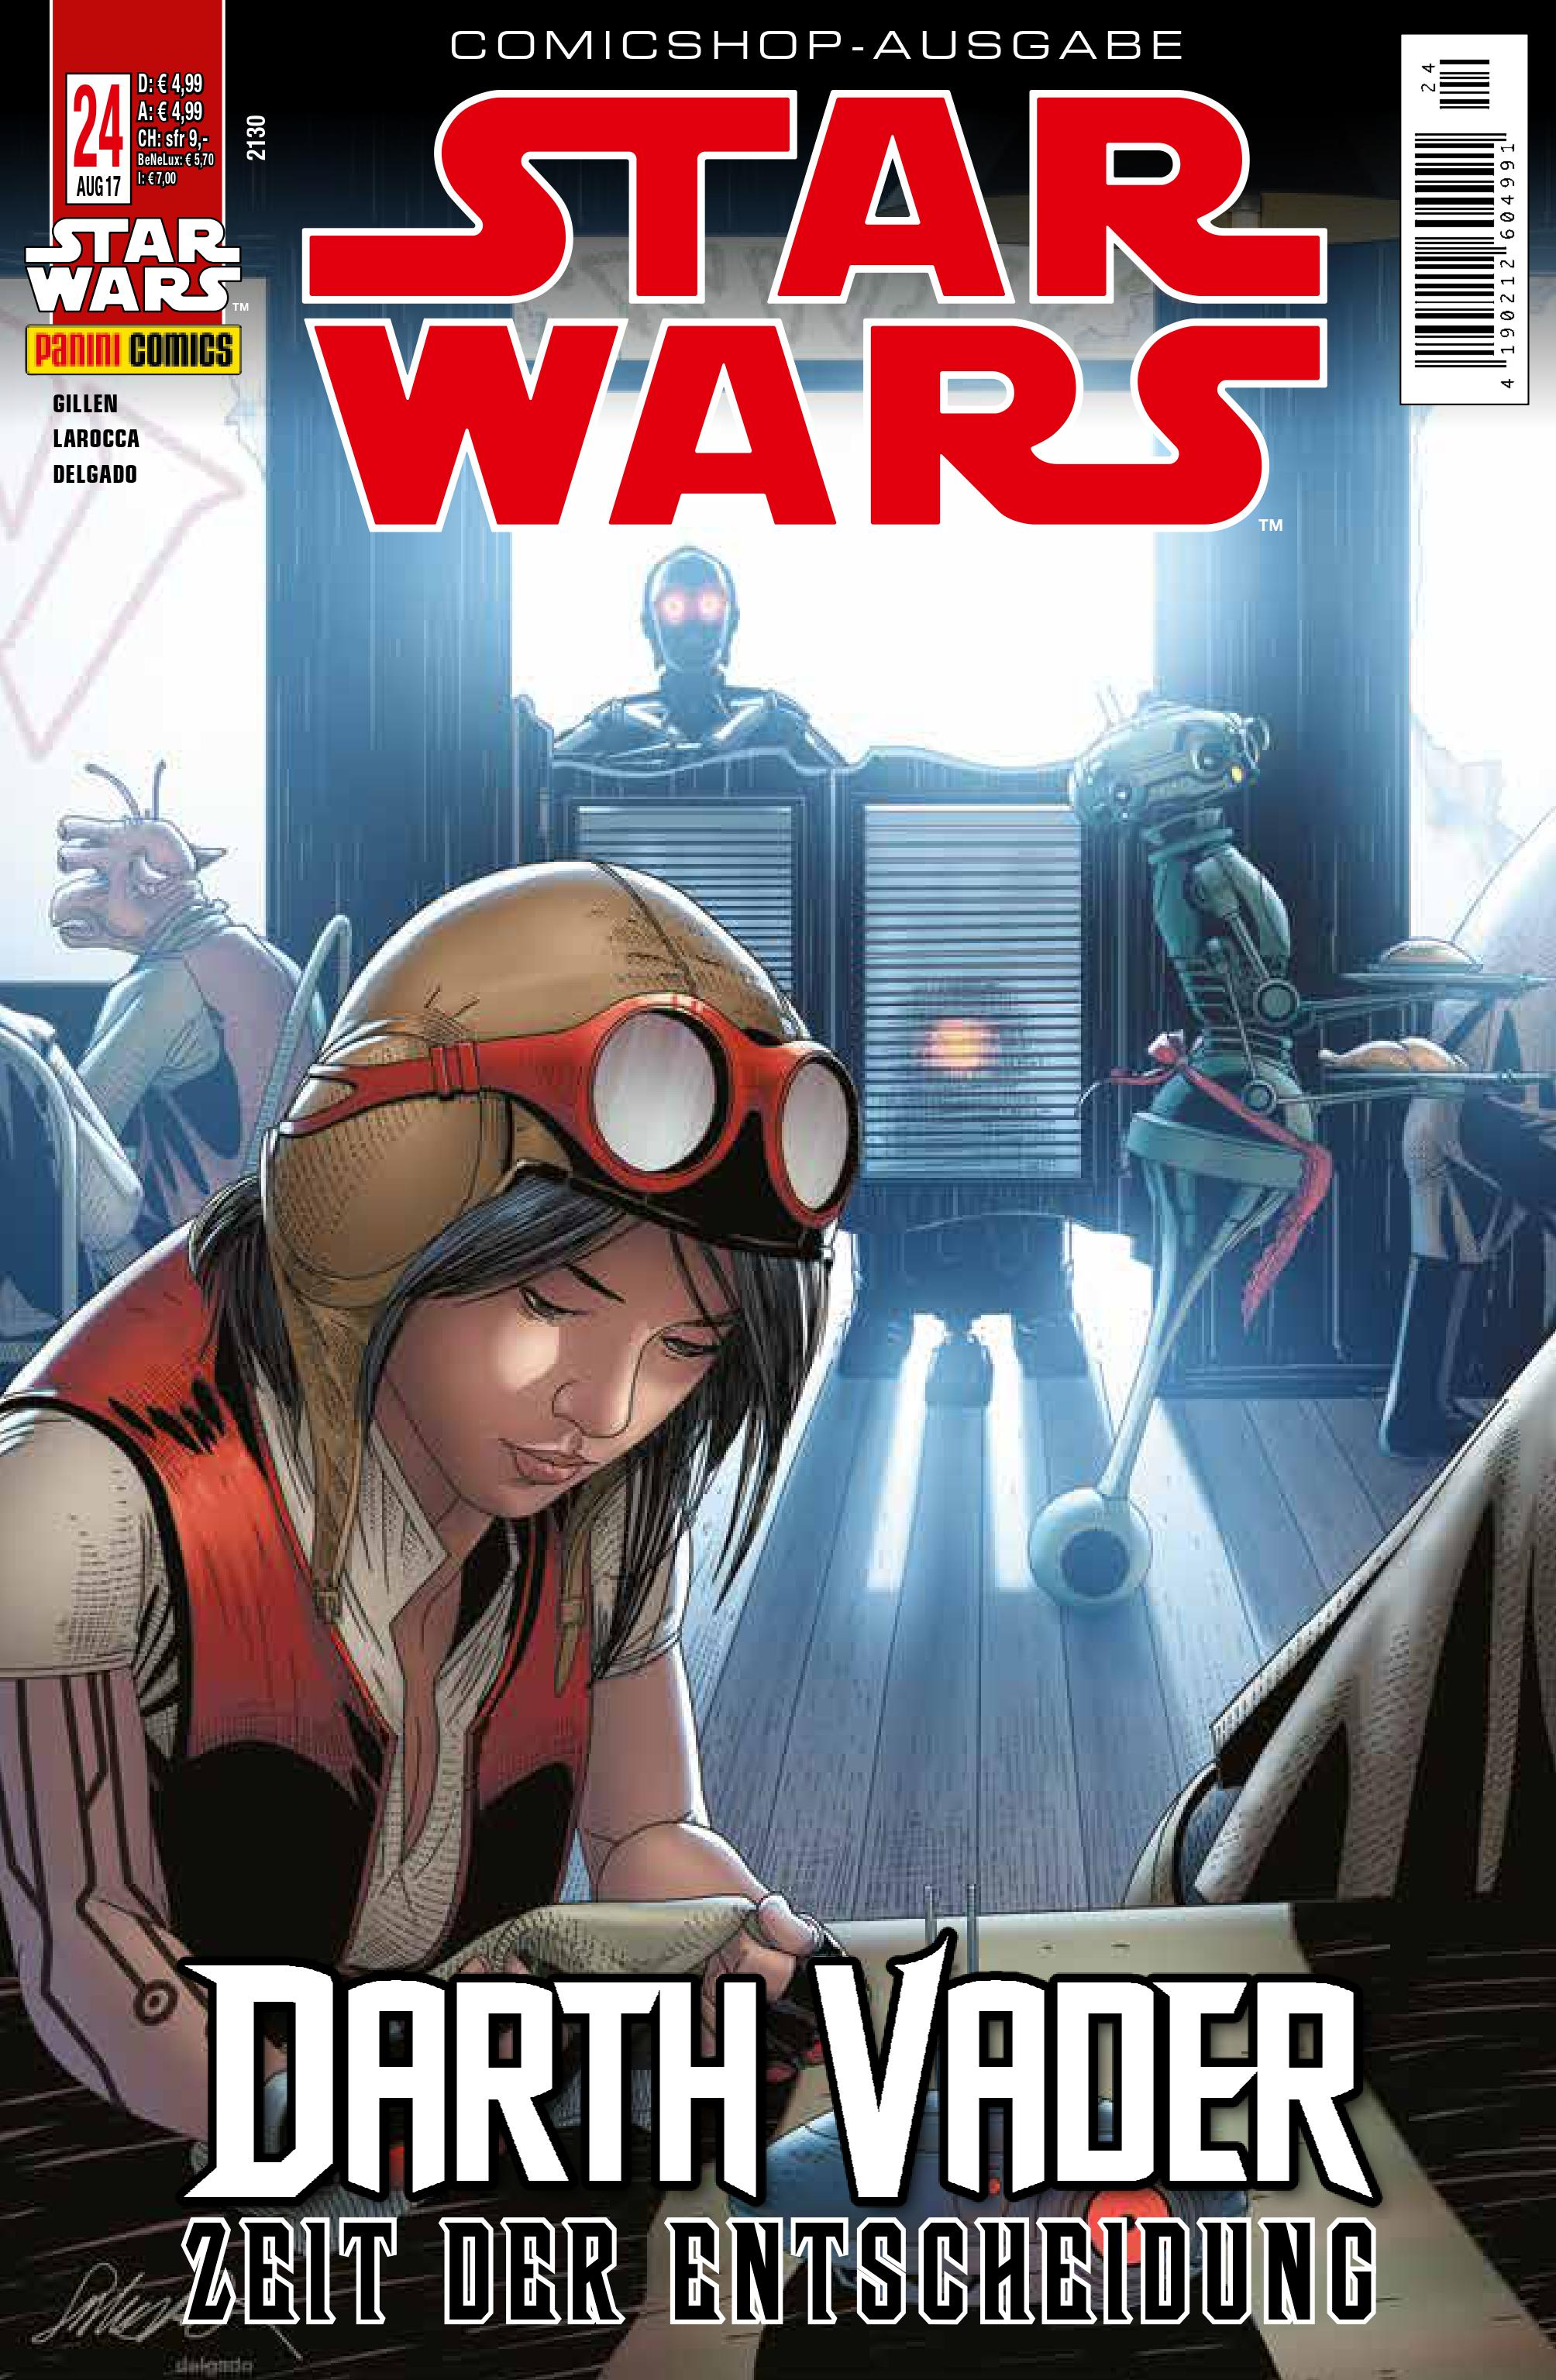 Star Wars #24 (Comicshop-Ausgabe) (19.07.2017)